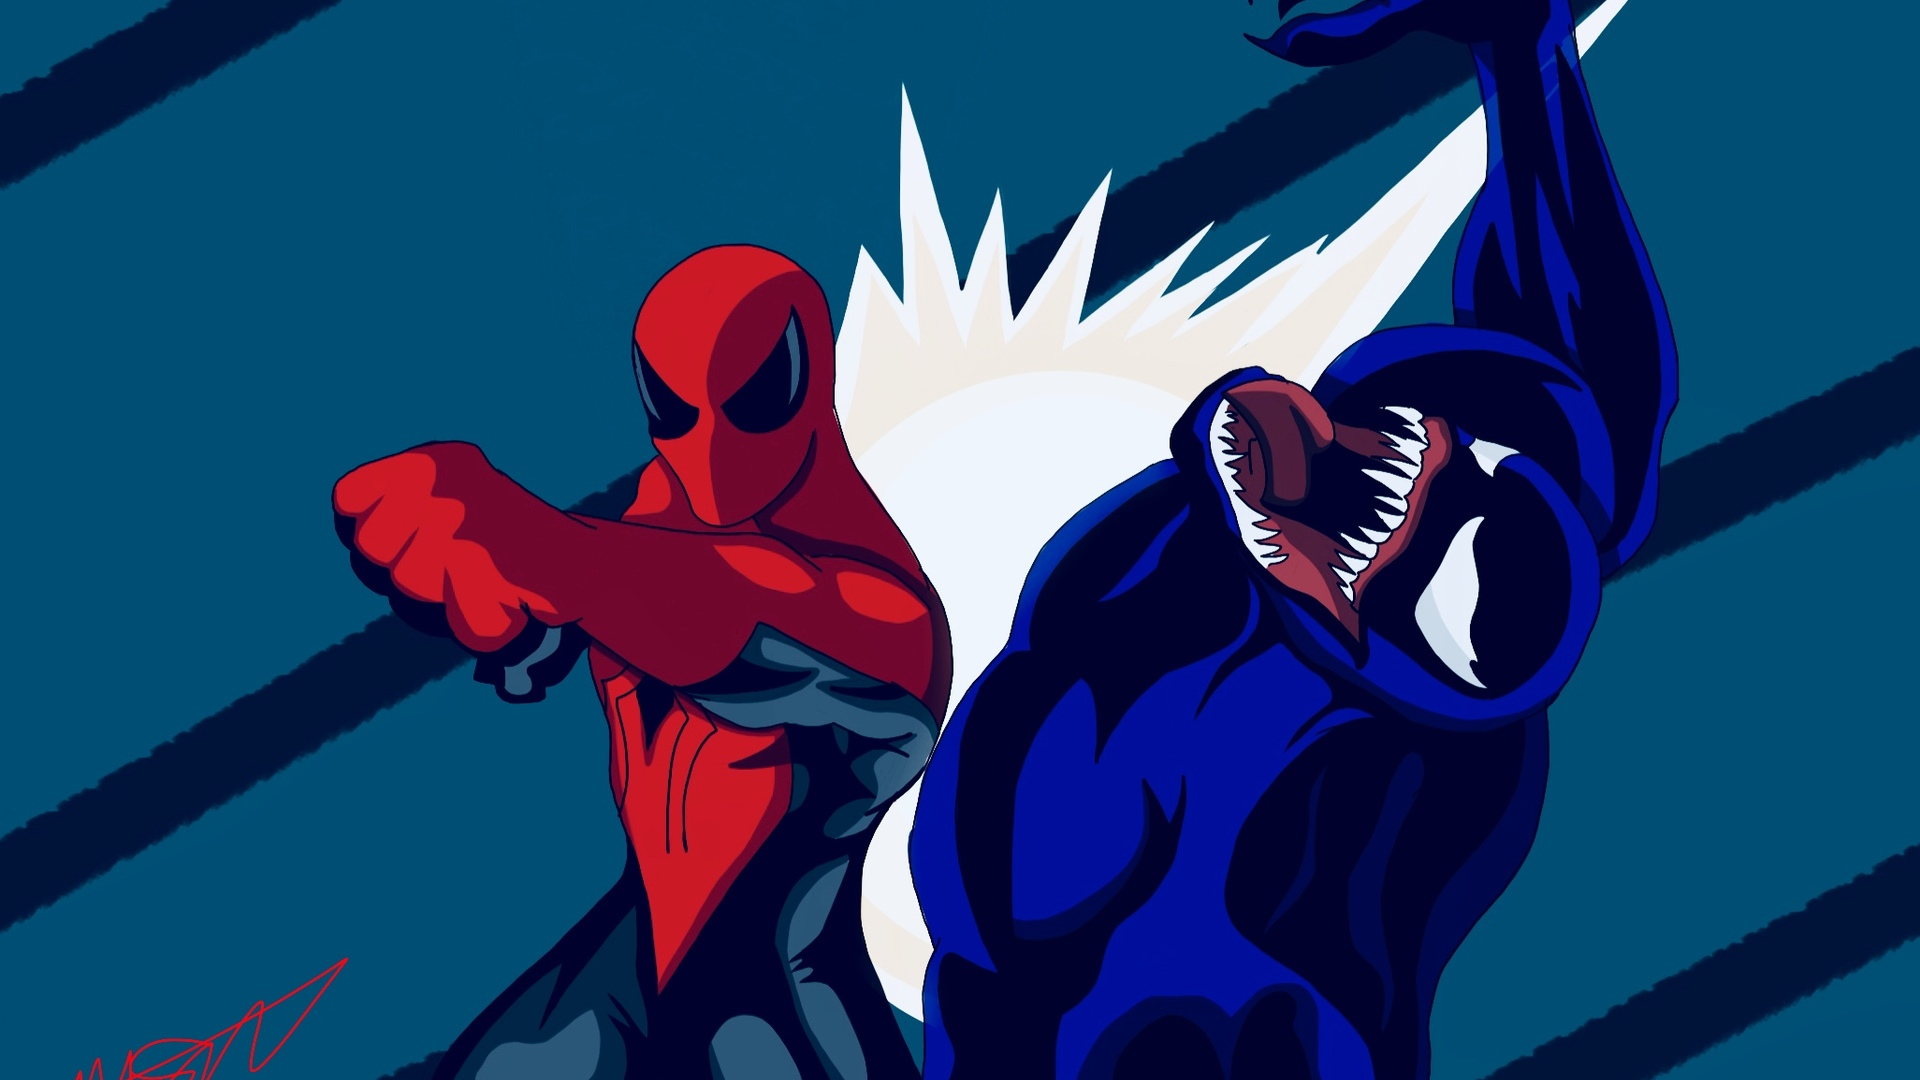 Spiderman Vs Venom Artwork Laptop Full HD 1080P HD 4k